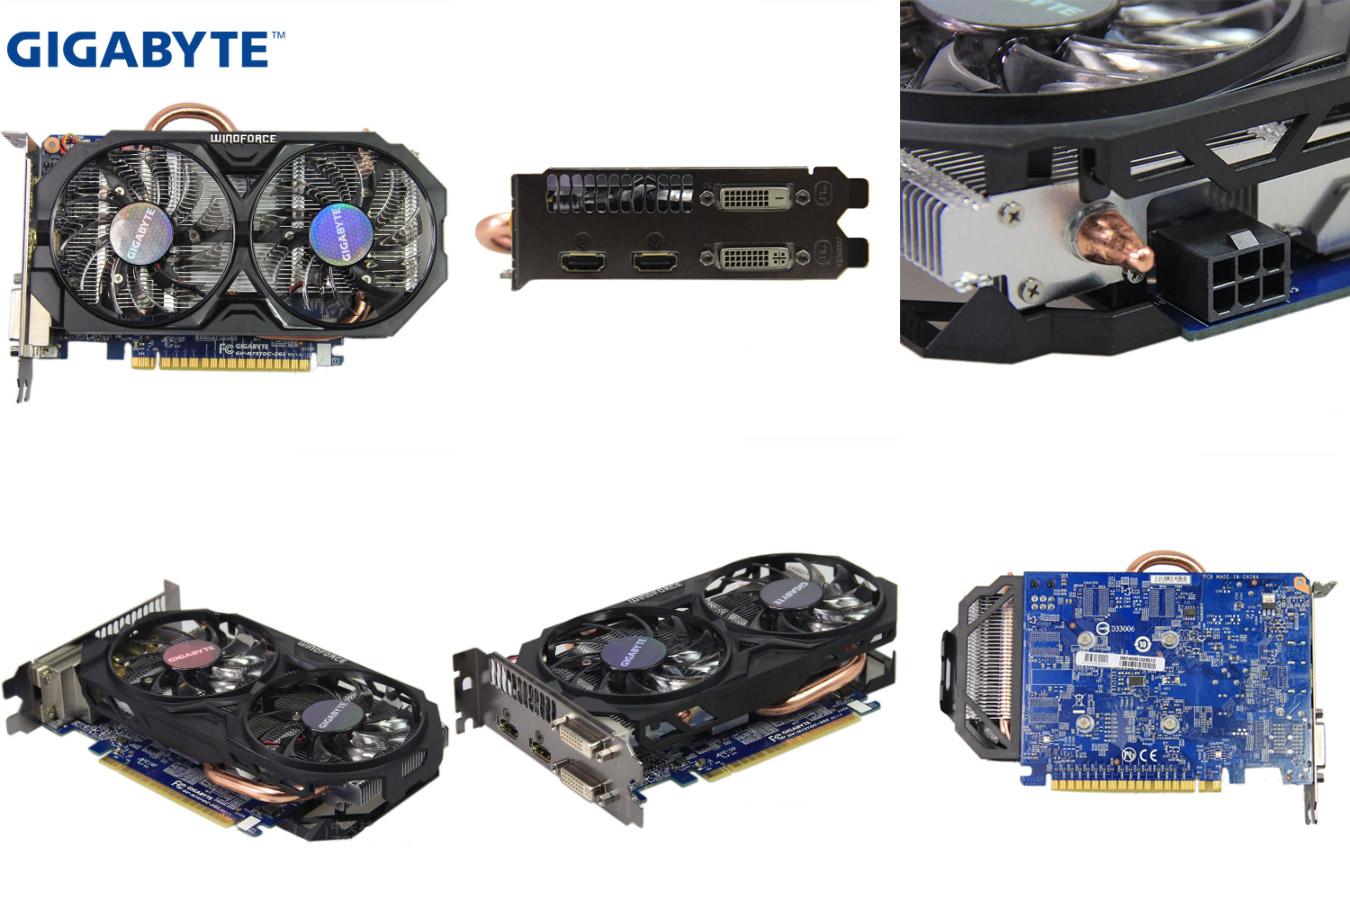 Недорогая GeForce GTX 750 Ti